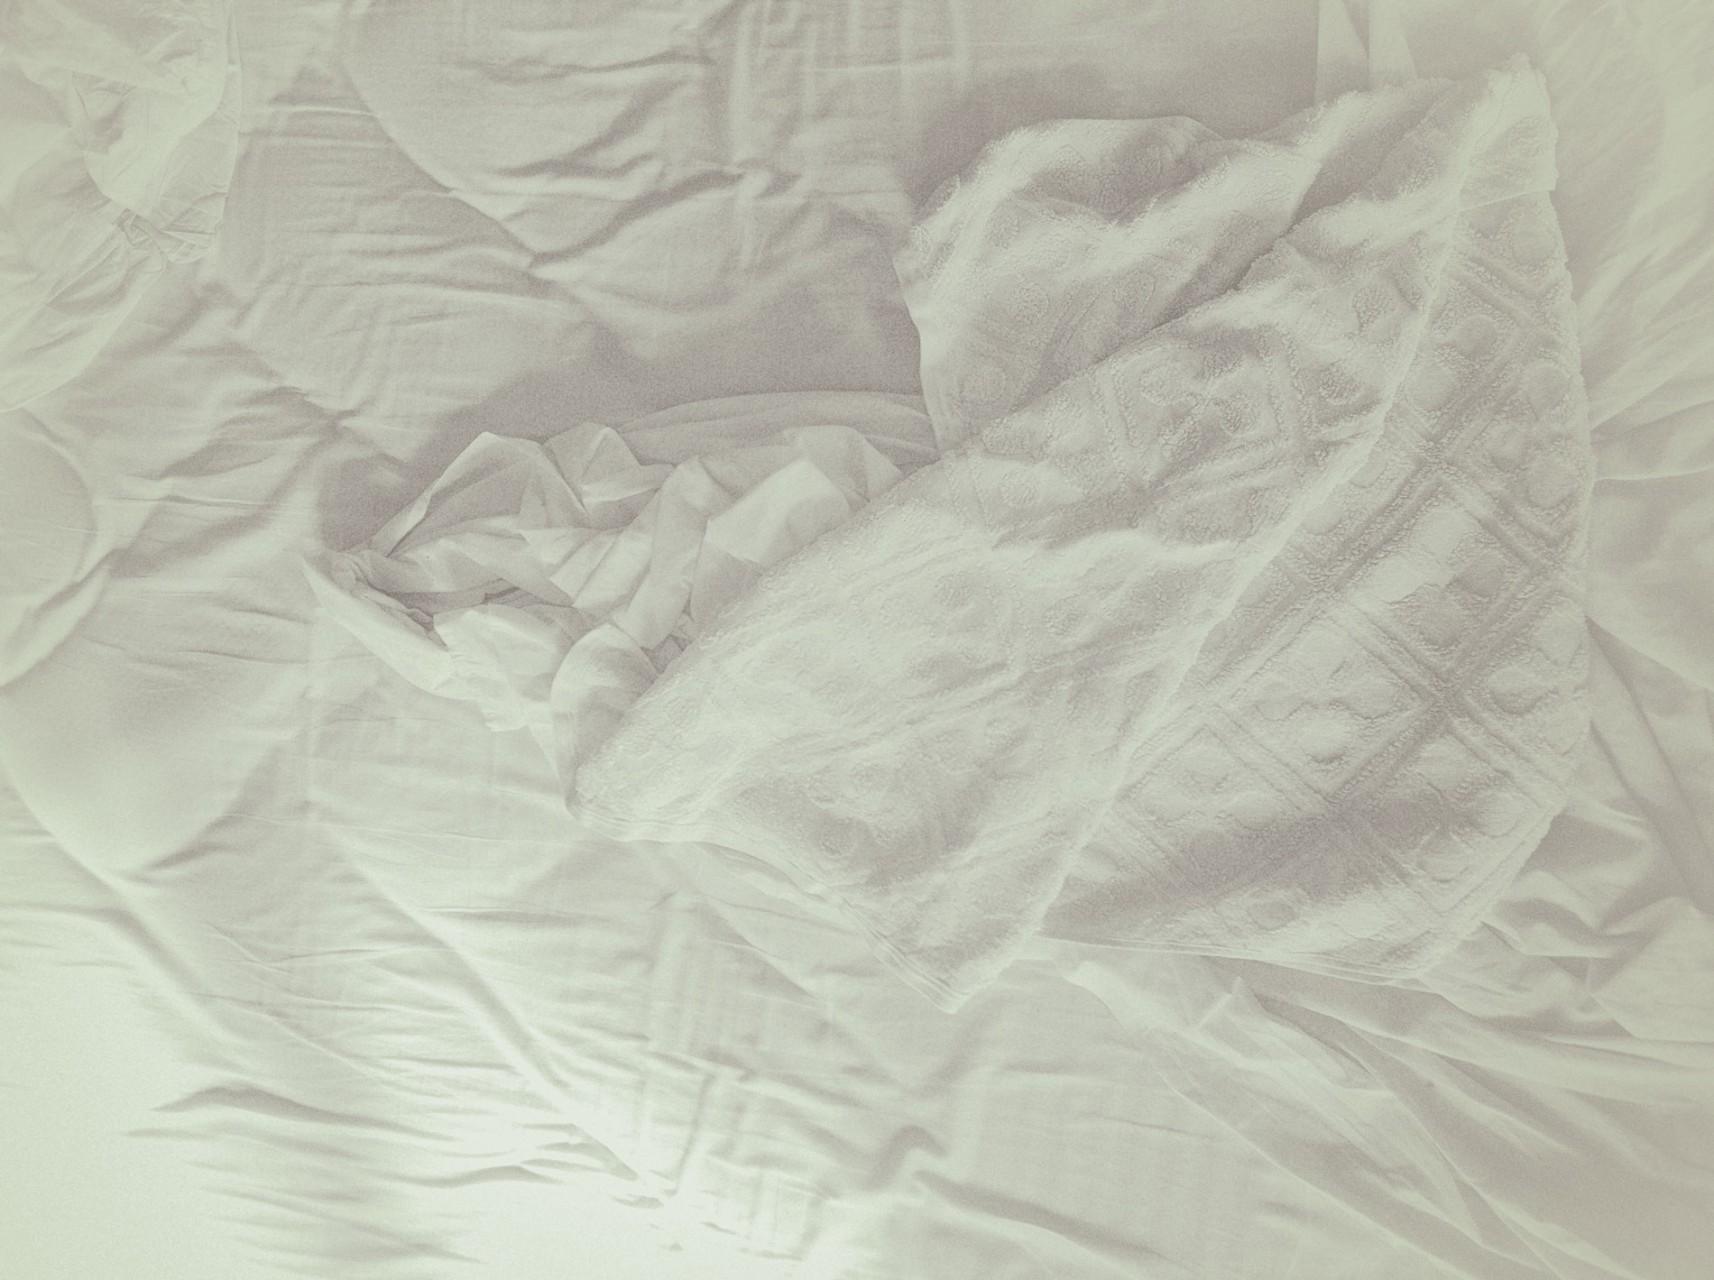 whitecontemplation-agneslegros-website